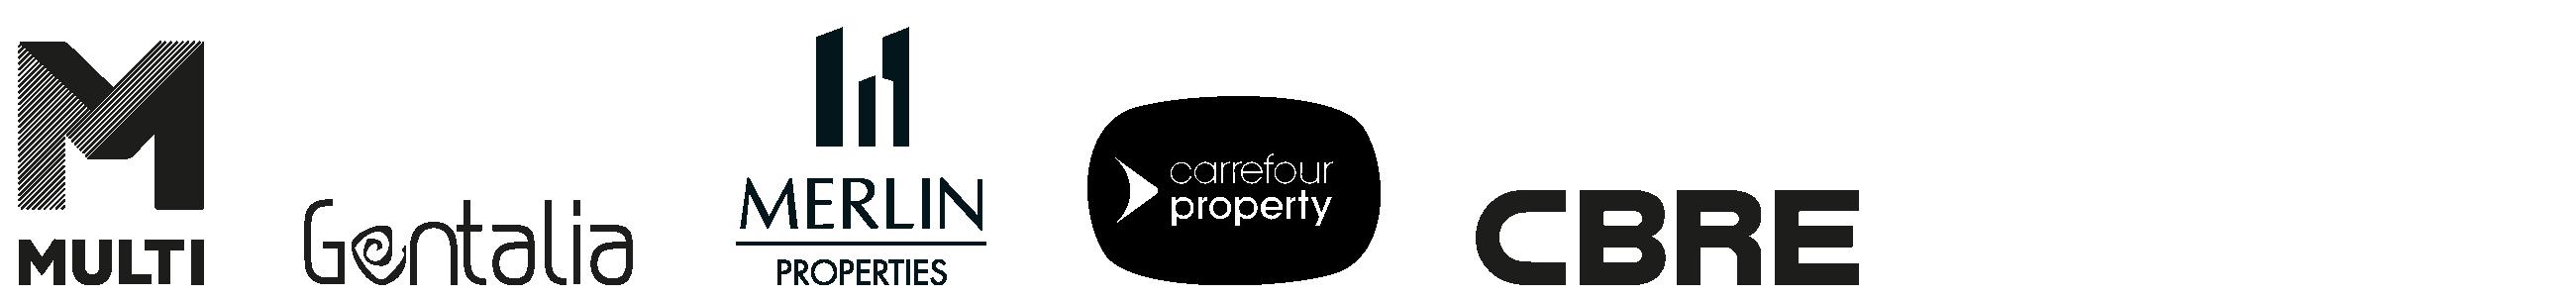 MADHOUSE – WEB_V3_TROLLS – CLIENTES